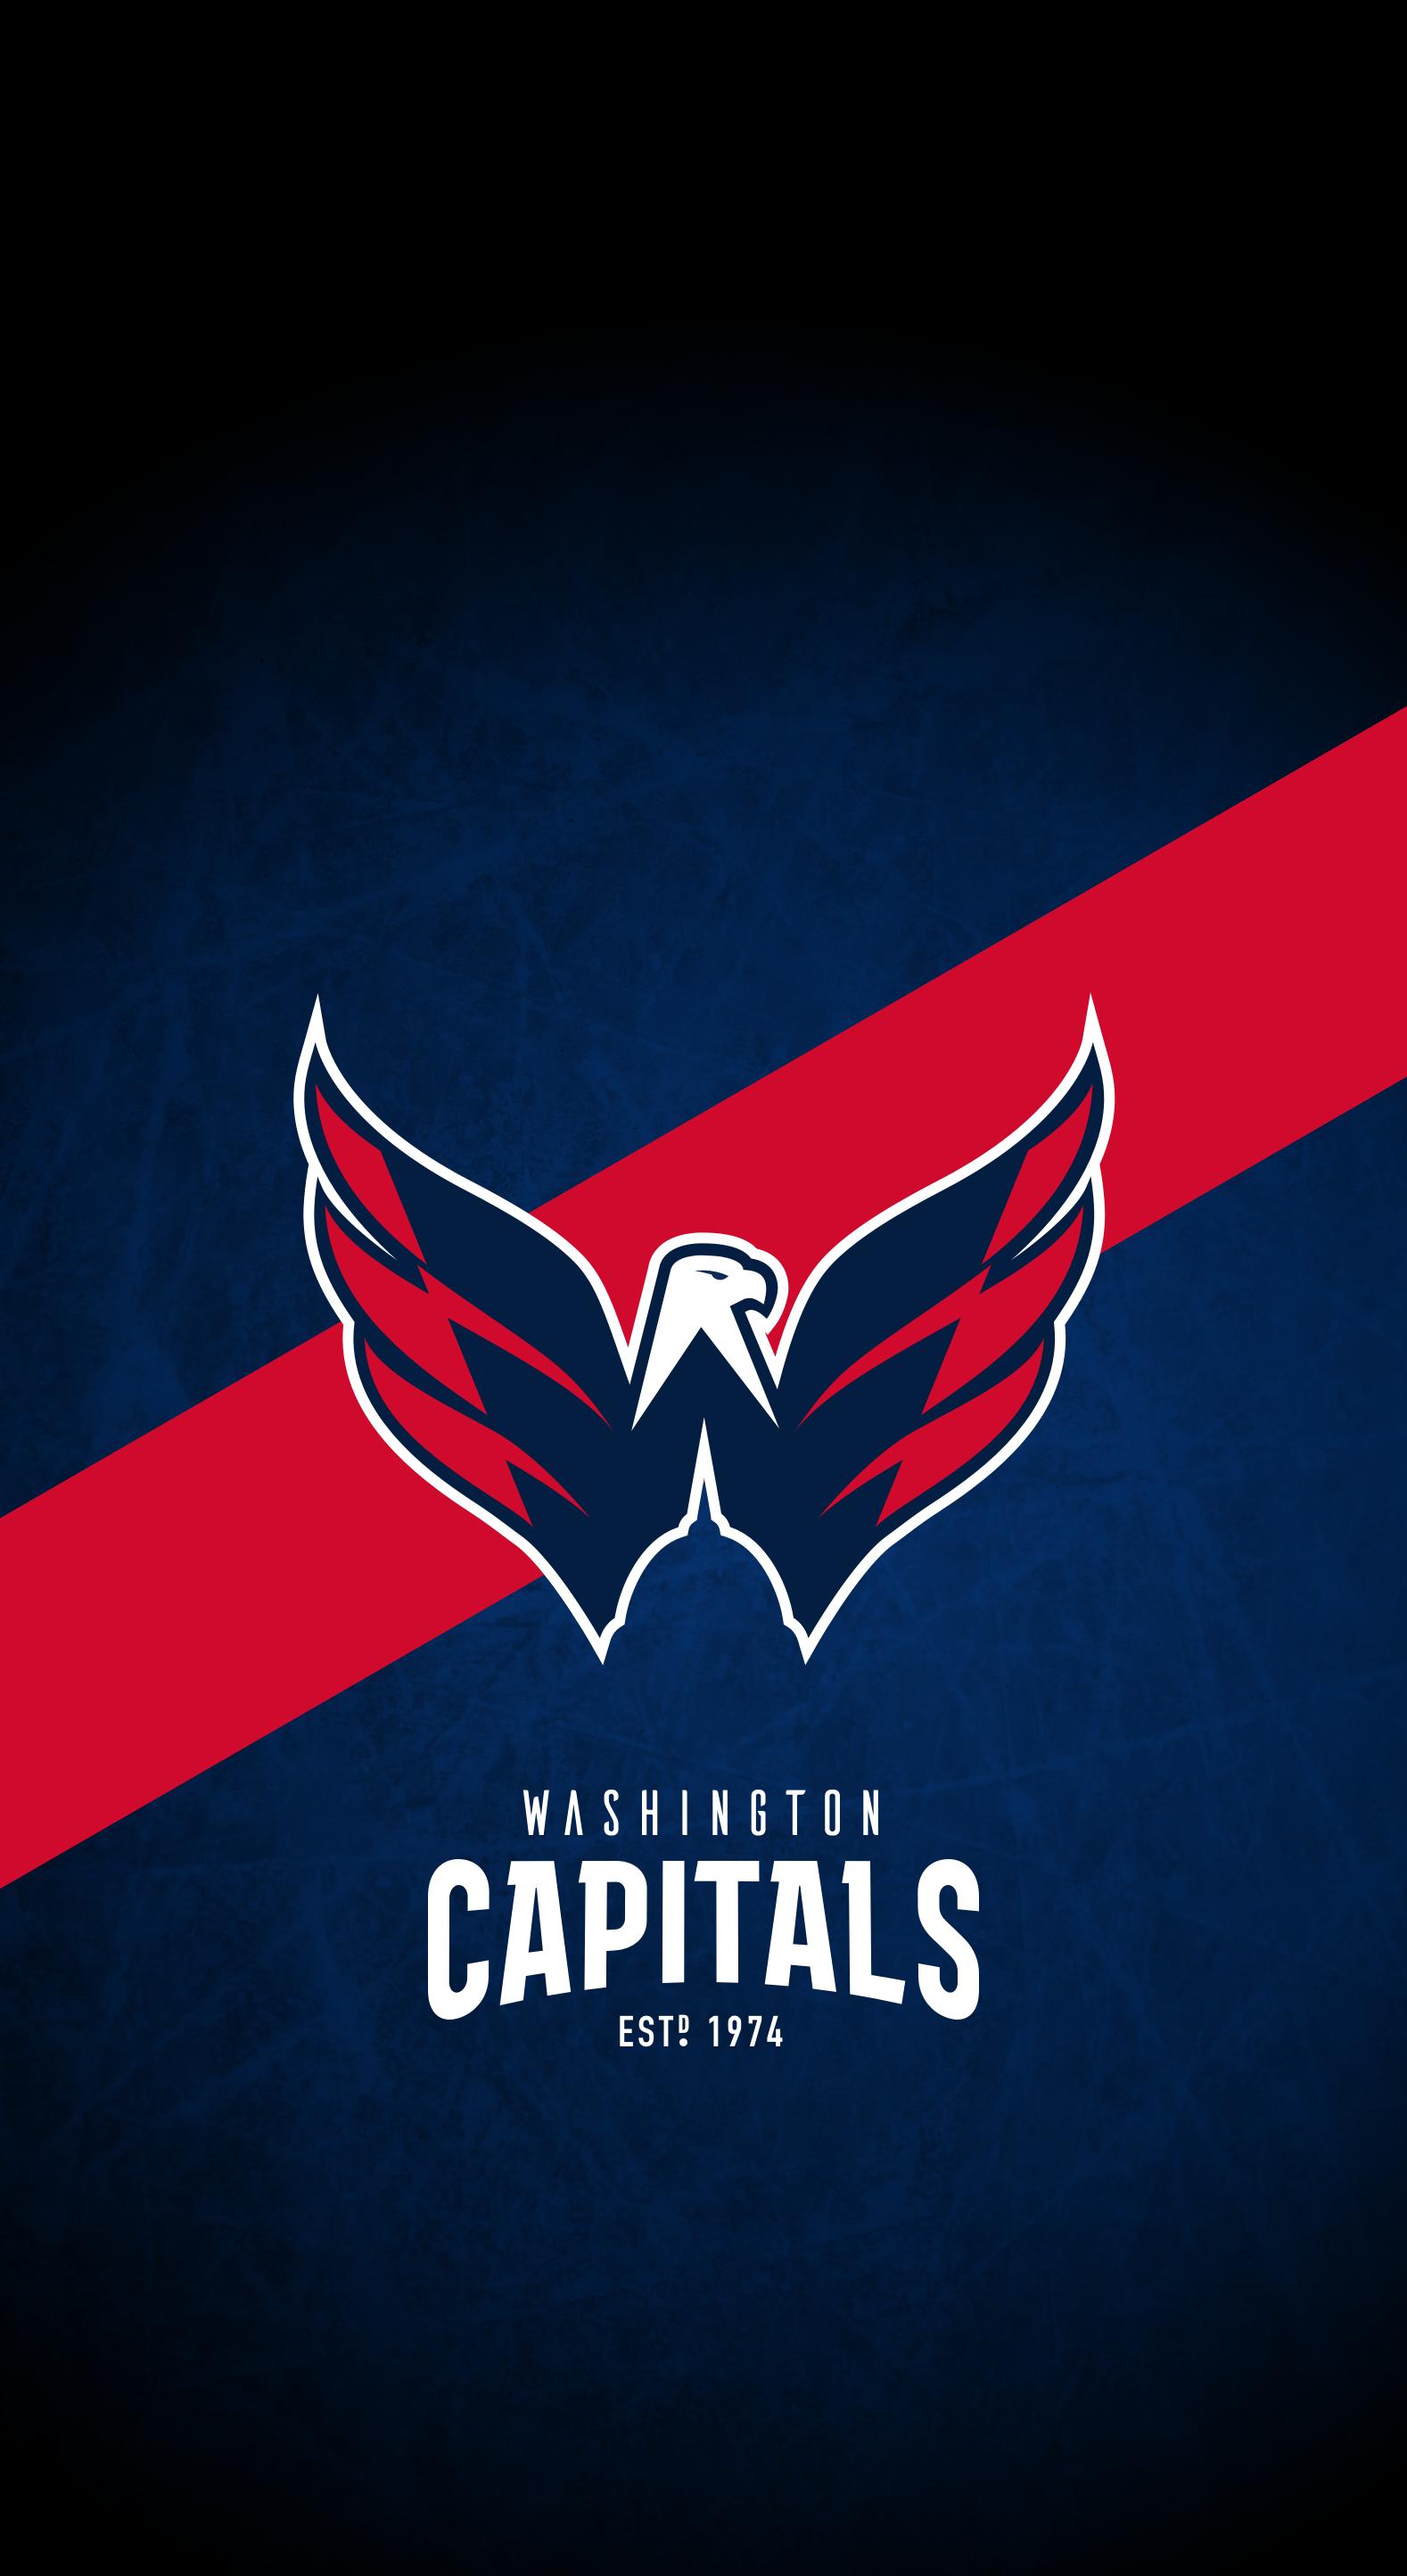 Washington Capitals Nhl Iphone X Xs Xr Lock Screen Wallpaper Washington Capitals Washington Capitals Hockey Nhl Wallpaper